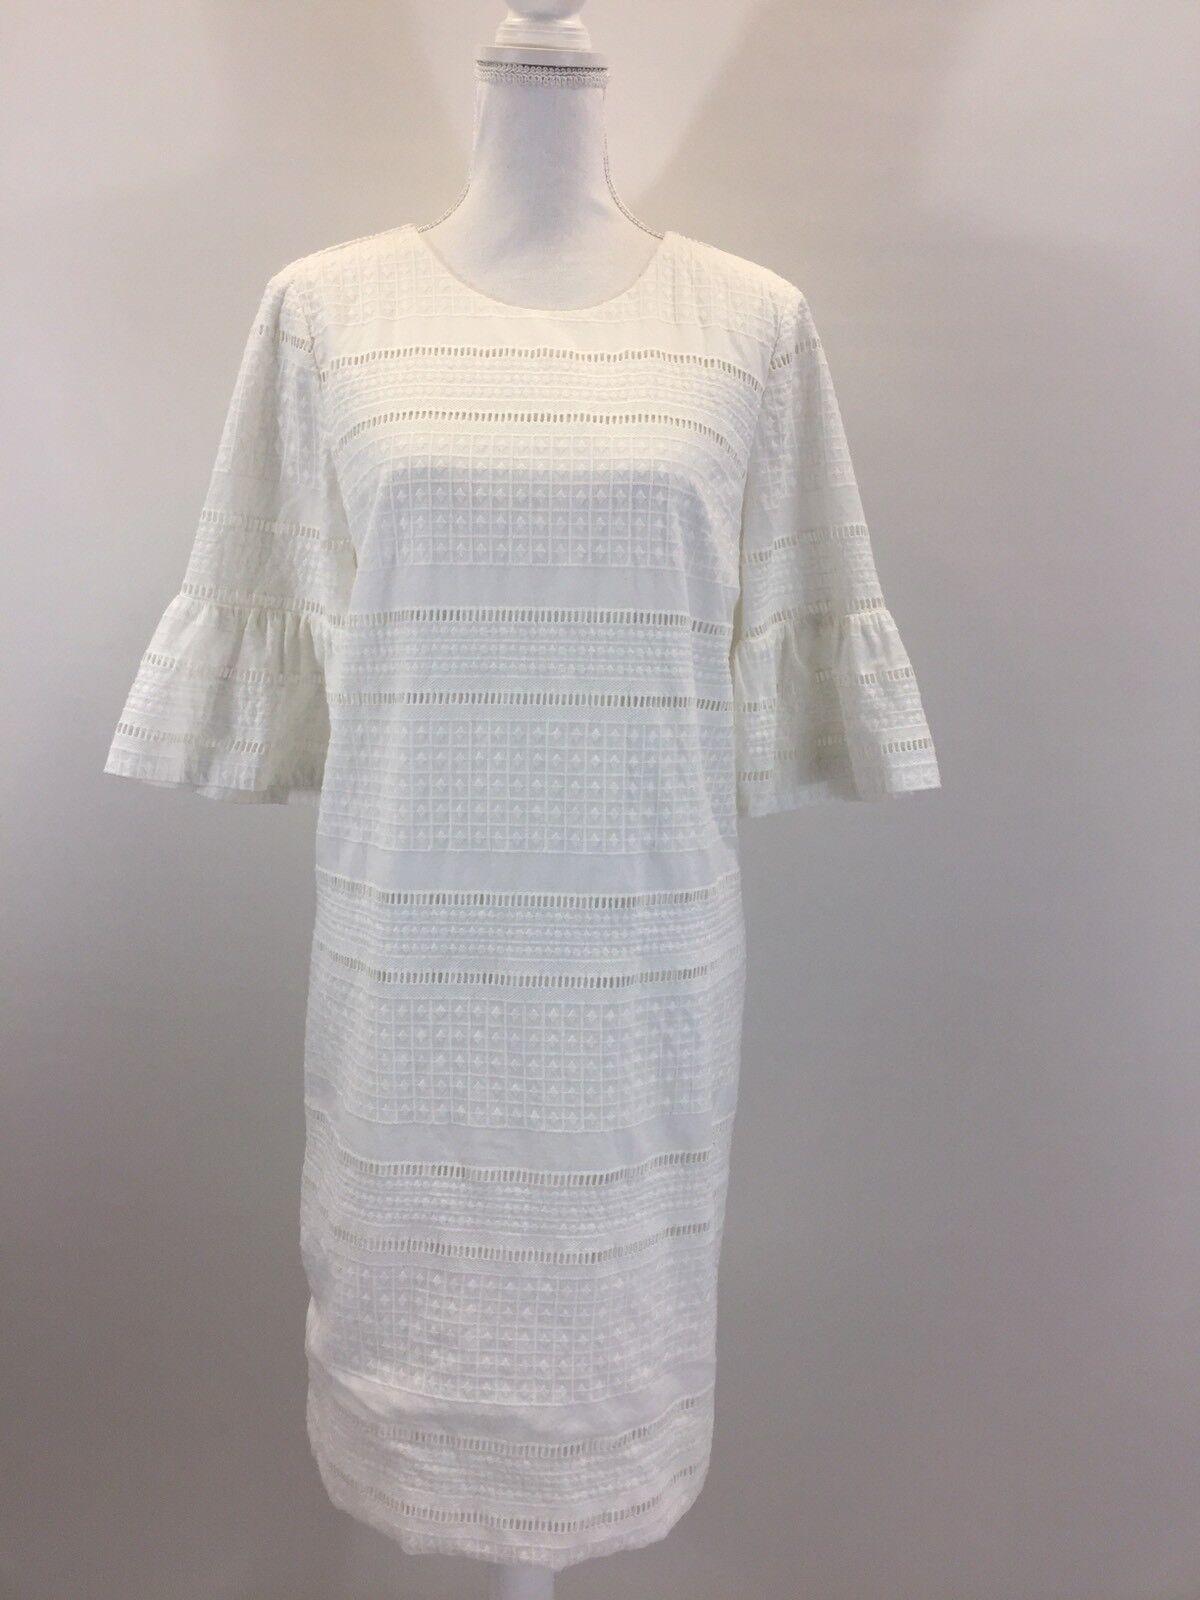 NEW J.Crew Eyelet Flutter Sleeve Cotton Shift Dress, G1269, Größe 2 Weiß,